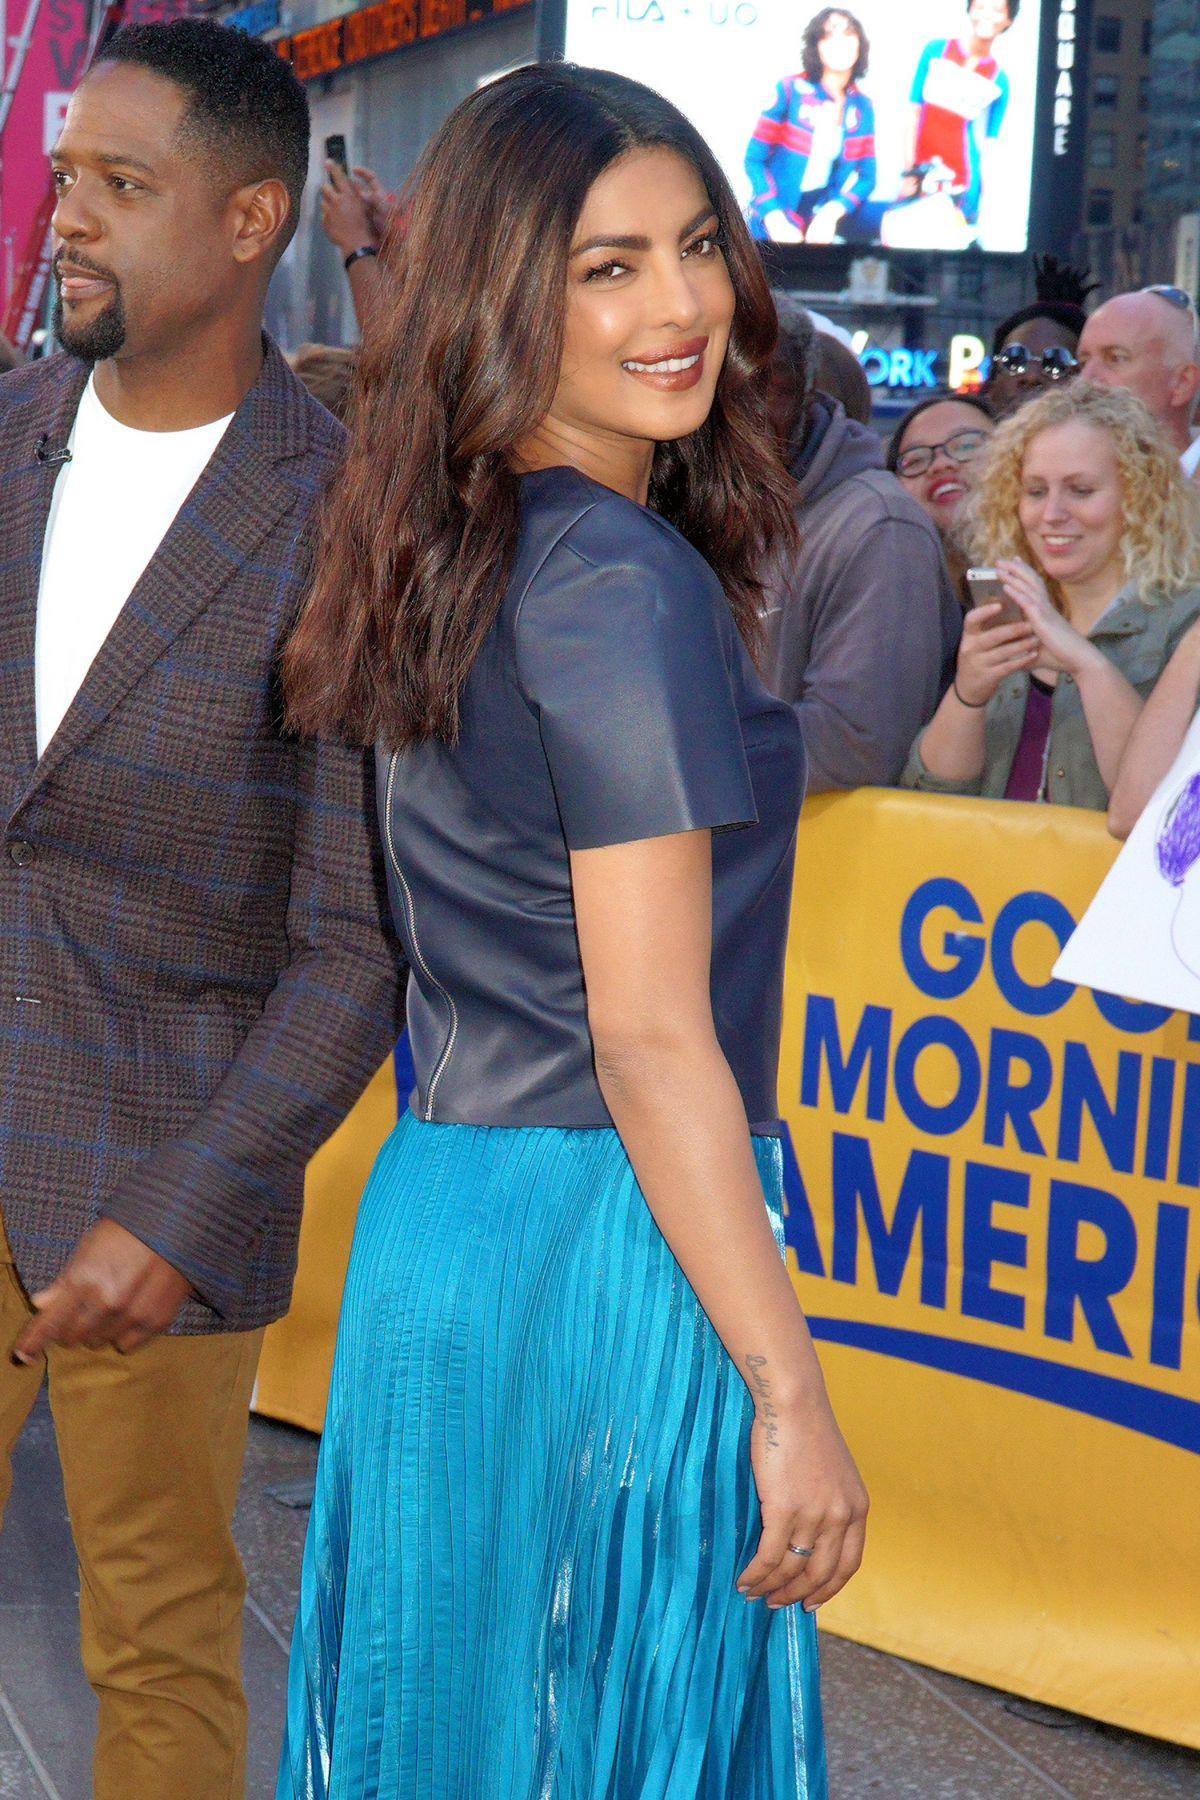 PRIYANKA CHOPRA at Good Morning America in New York 09/23/2016